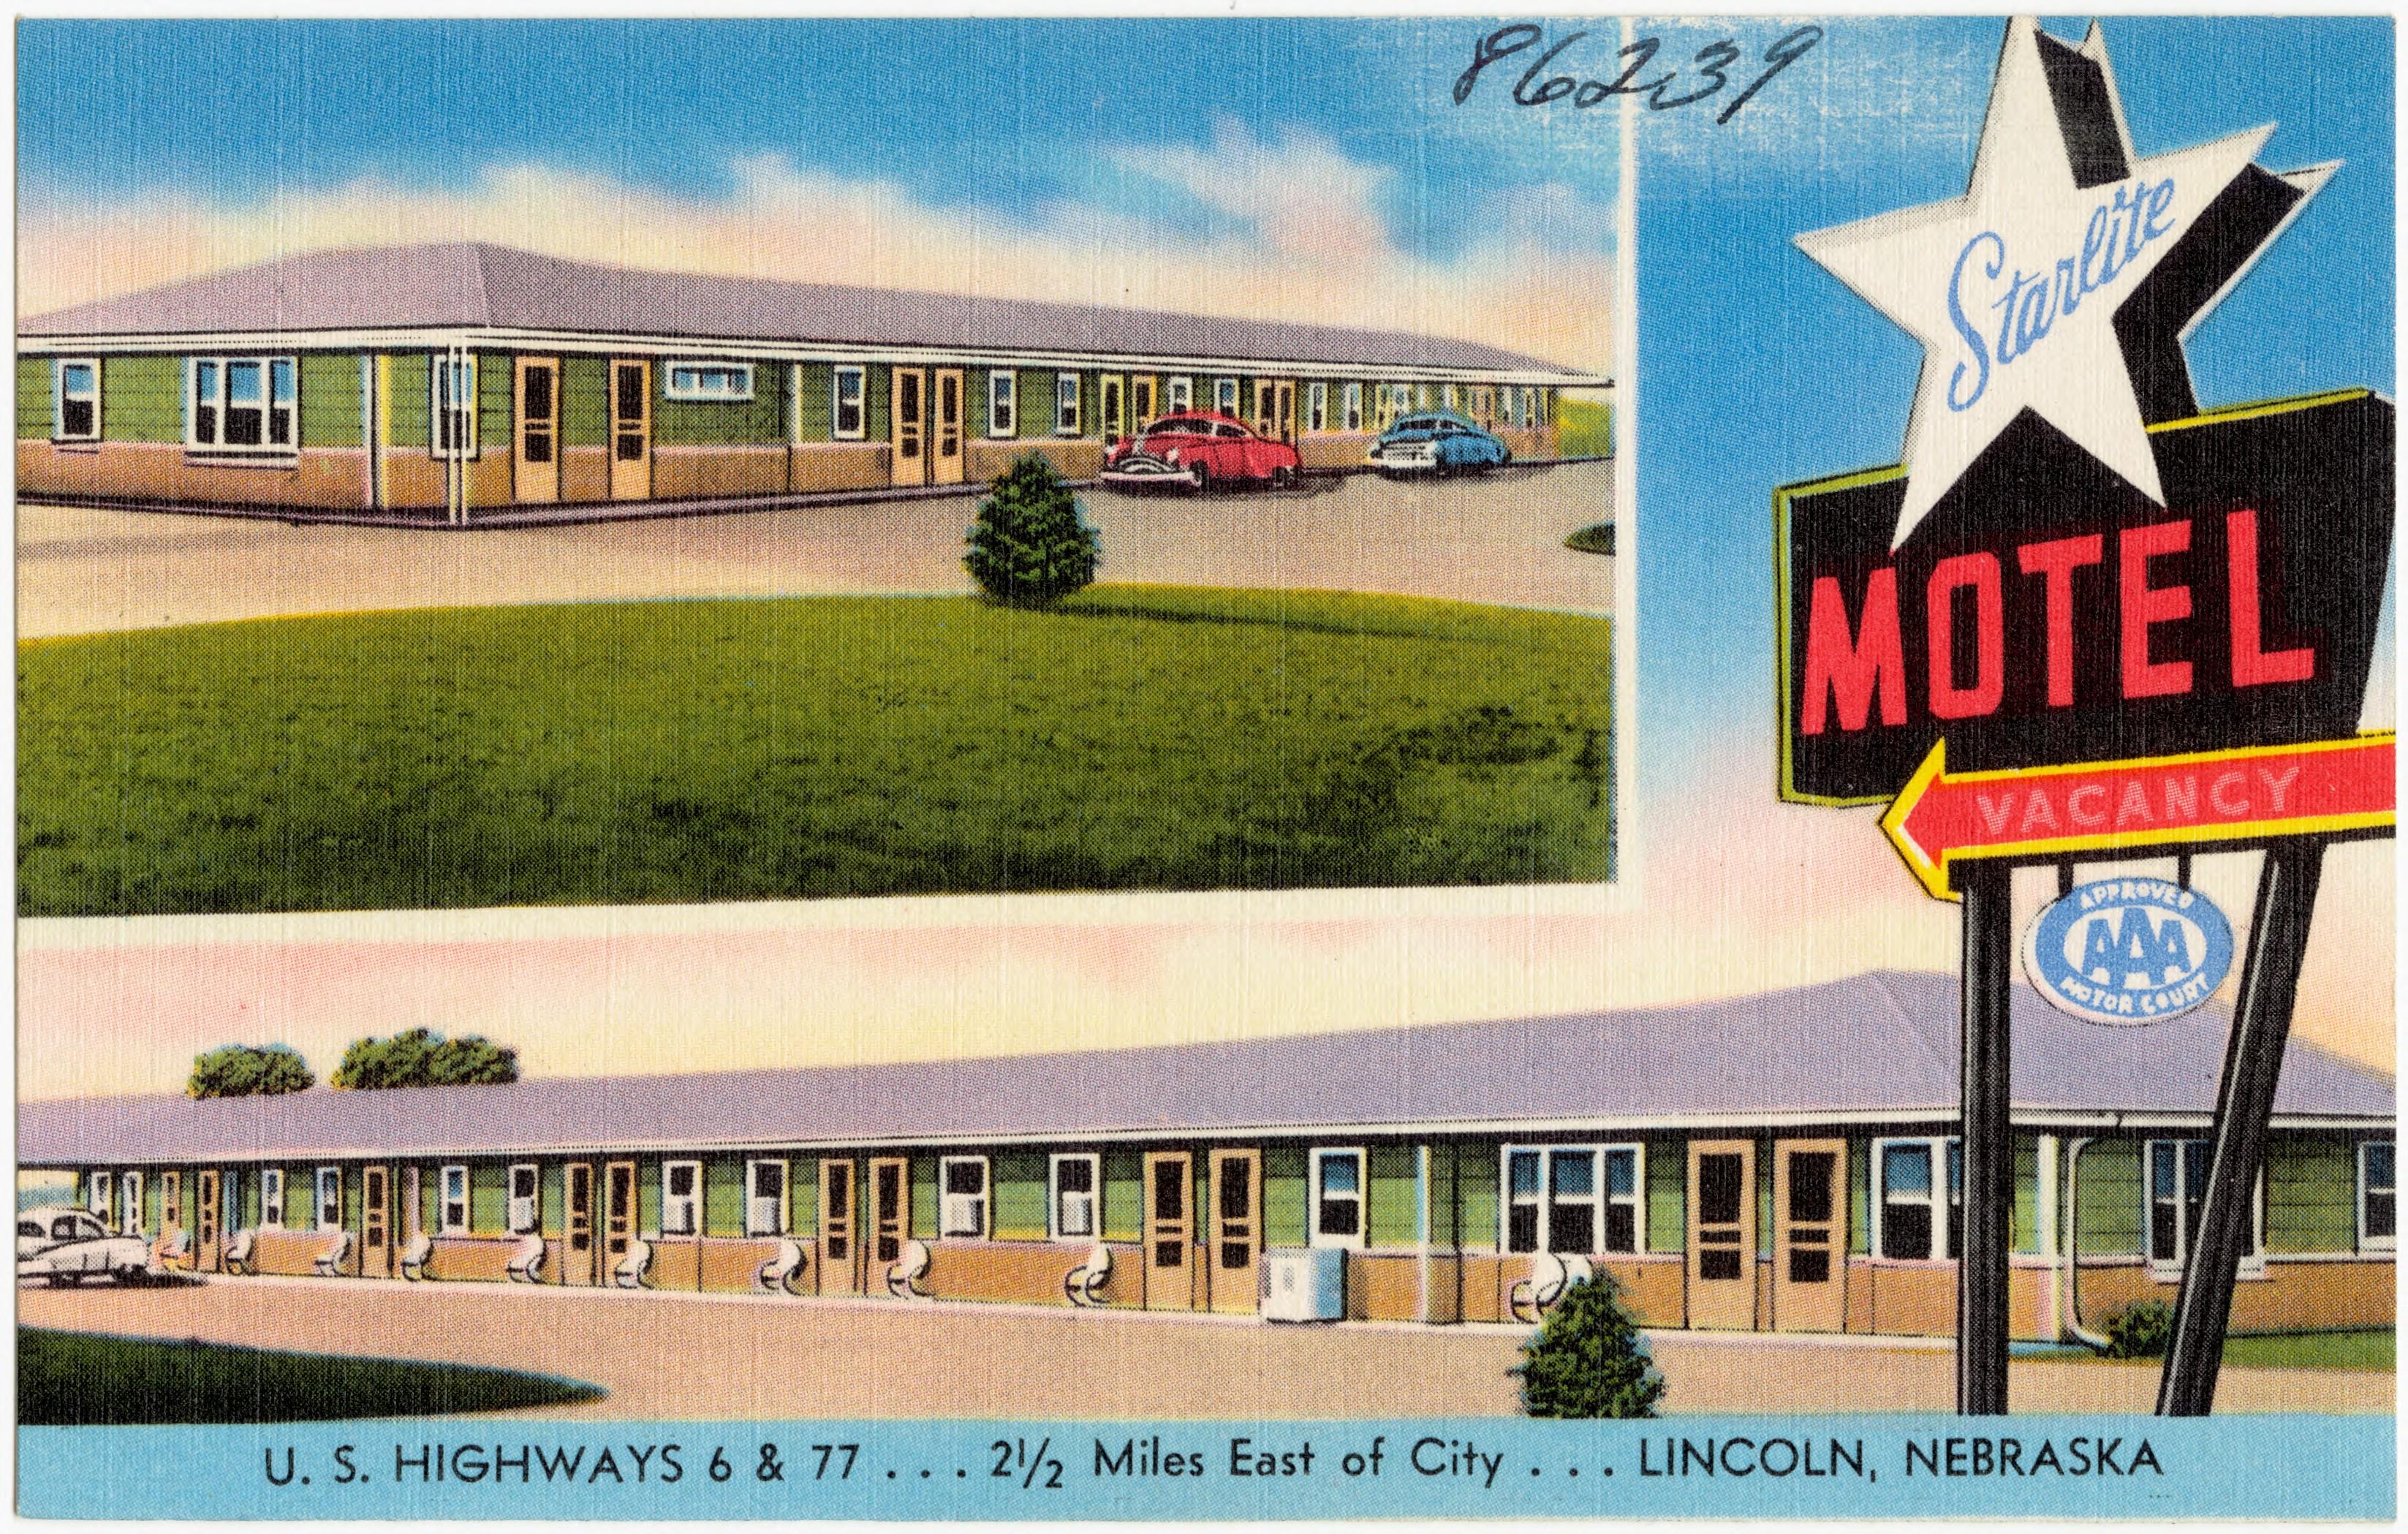 nebraska miles and highways lincoln motels starlite u wiki motel east of s city file